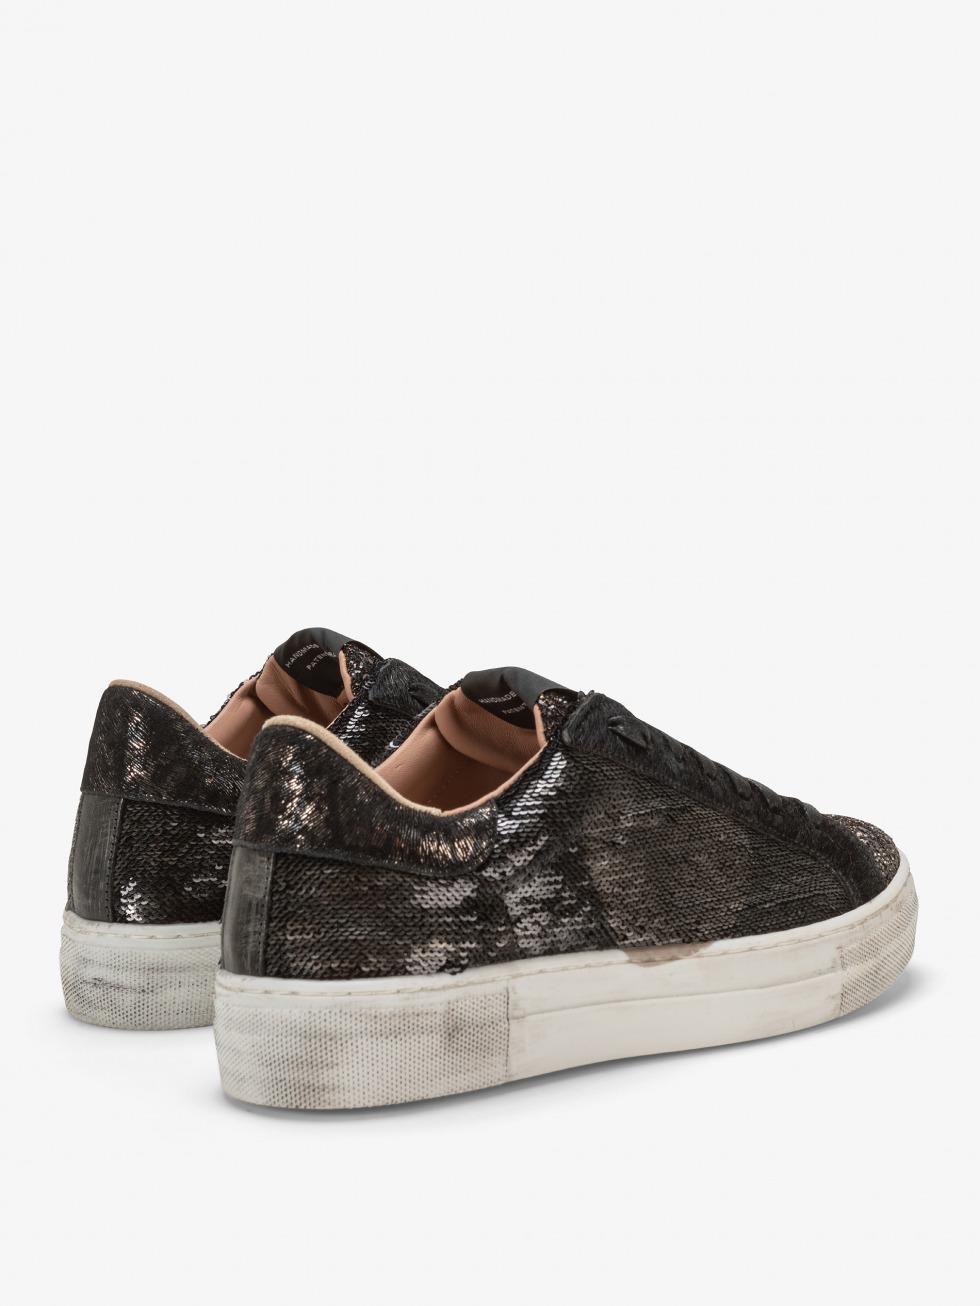 Martini Dazzling Black Sneakers - Bronze Heart